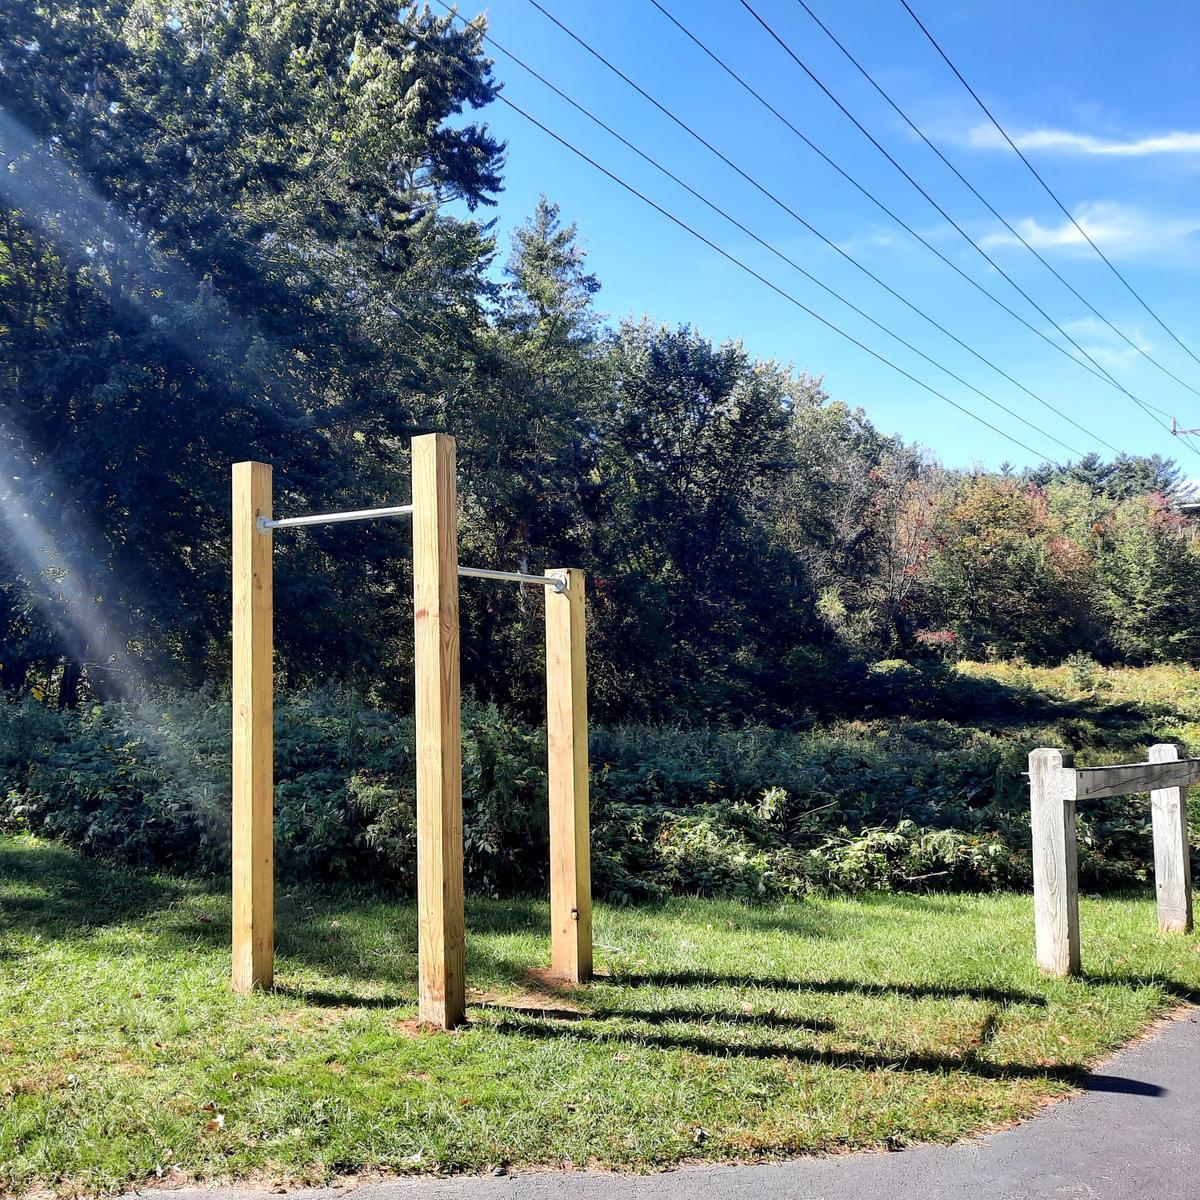 Exercise station along the Bethel Pathway. Photo credit: Enock Glidden